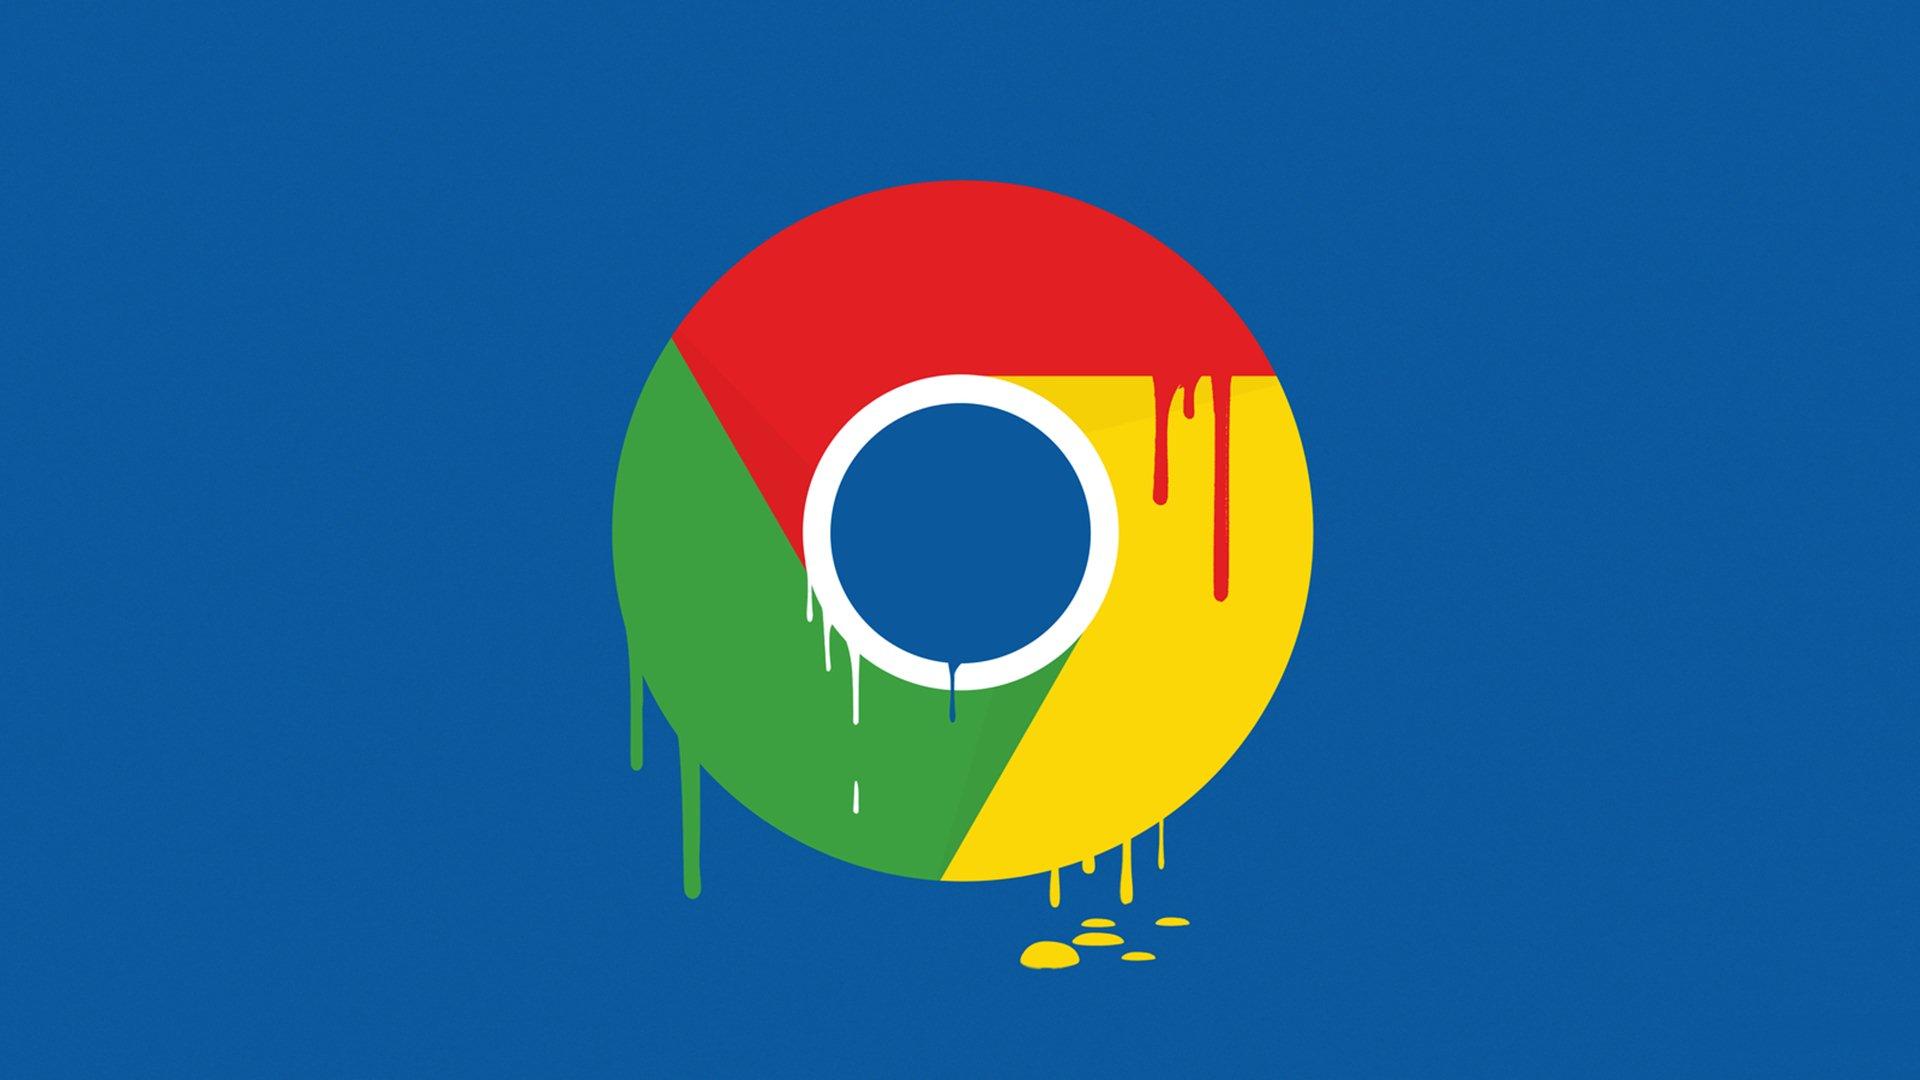 Google widescreen wallpapers